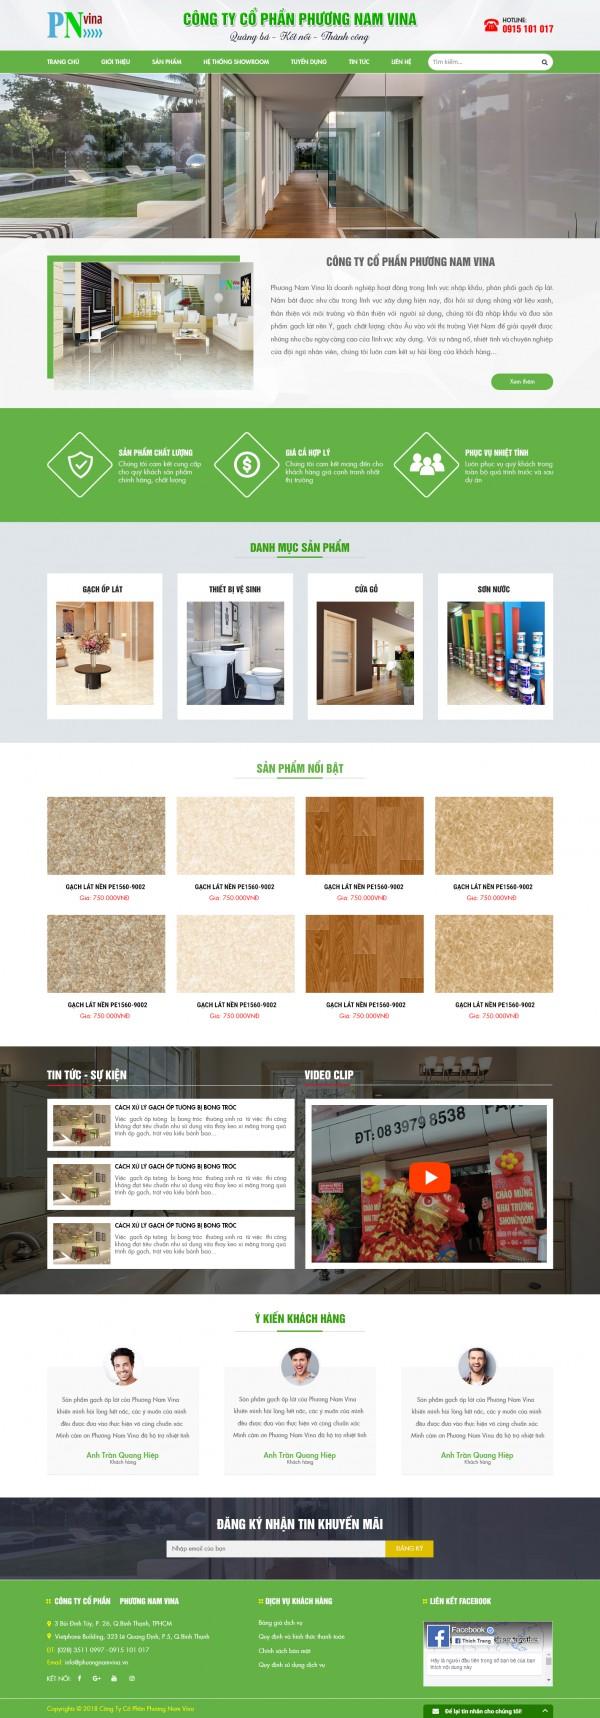 Giao diện website Công ty Cổ phần MS35